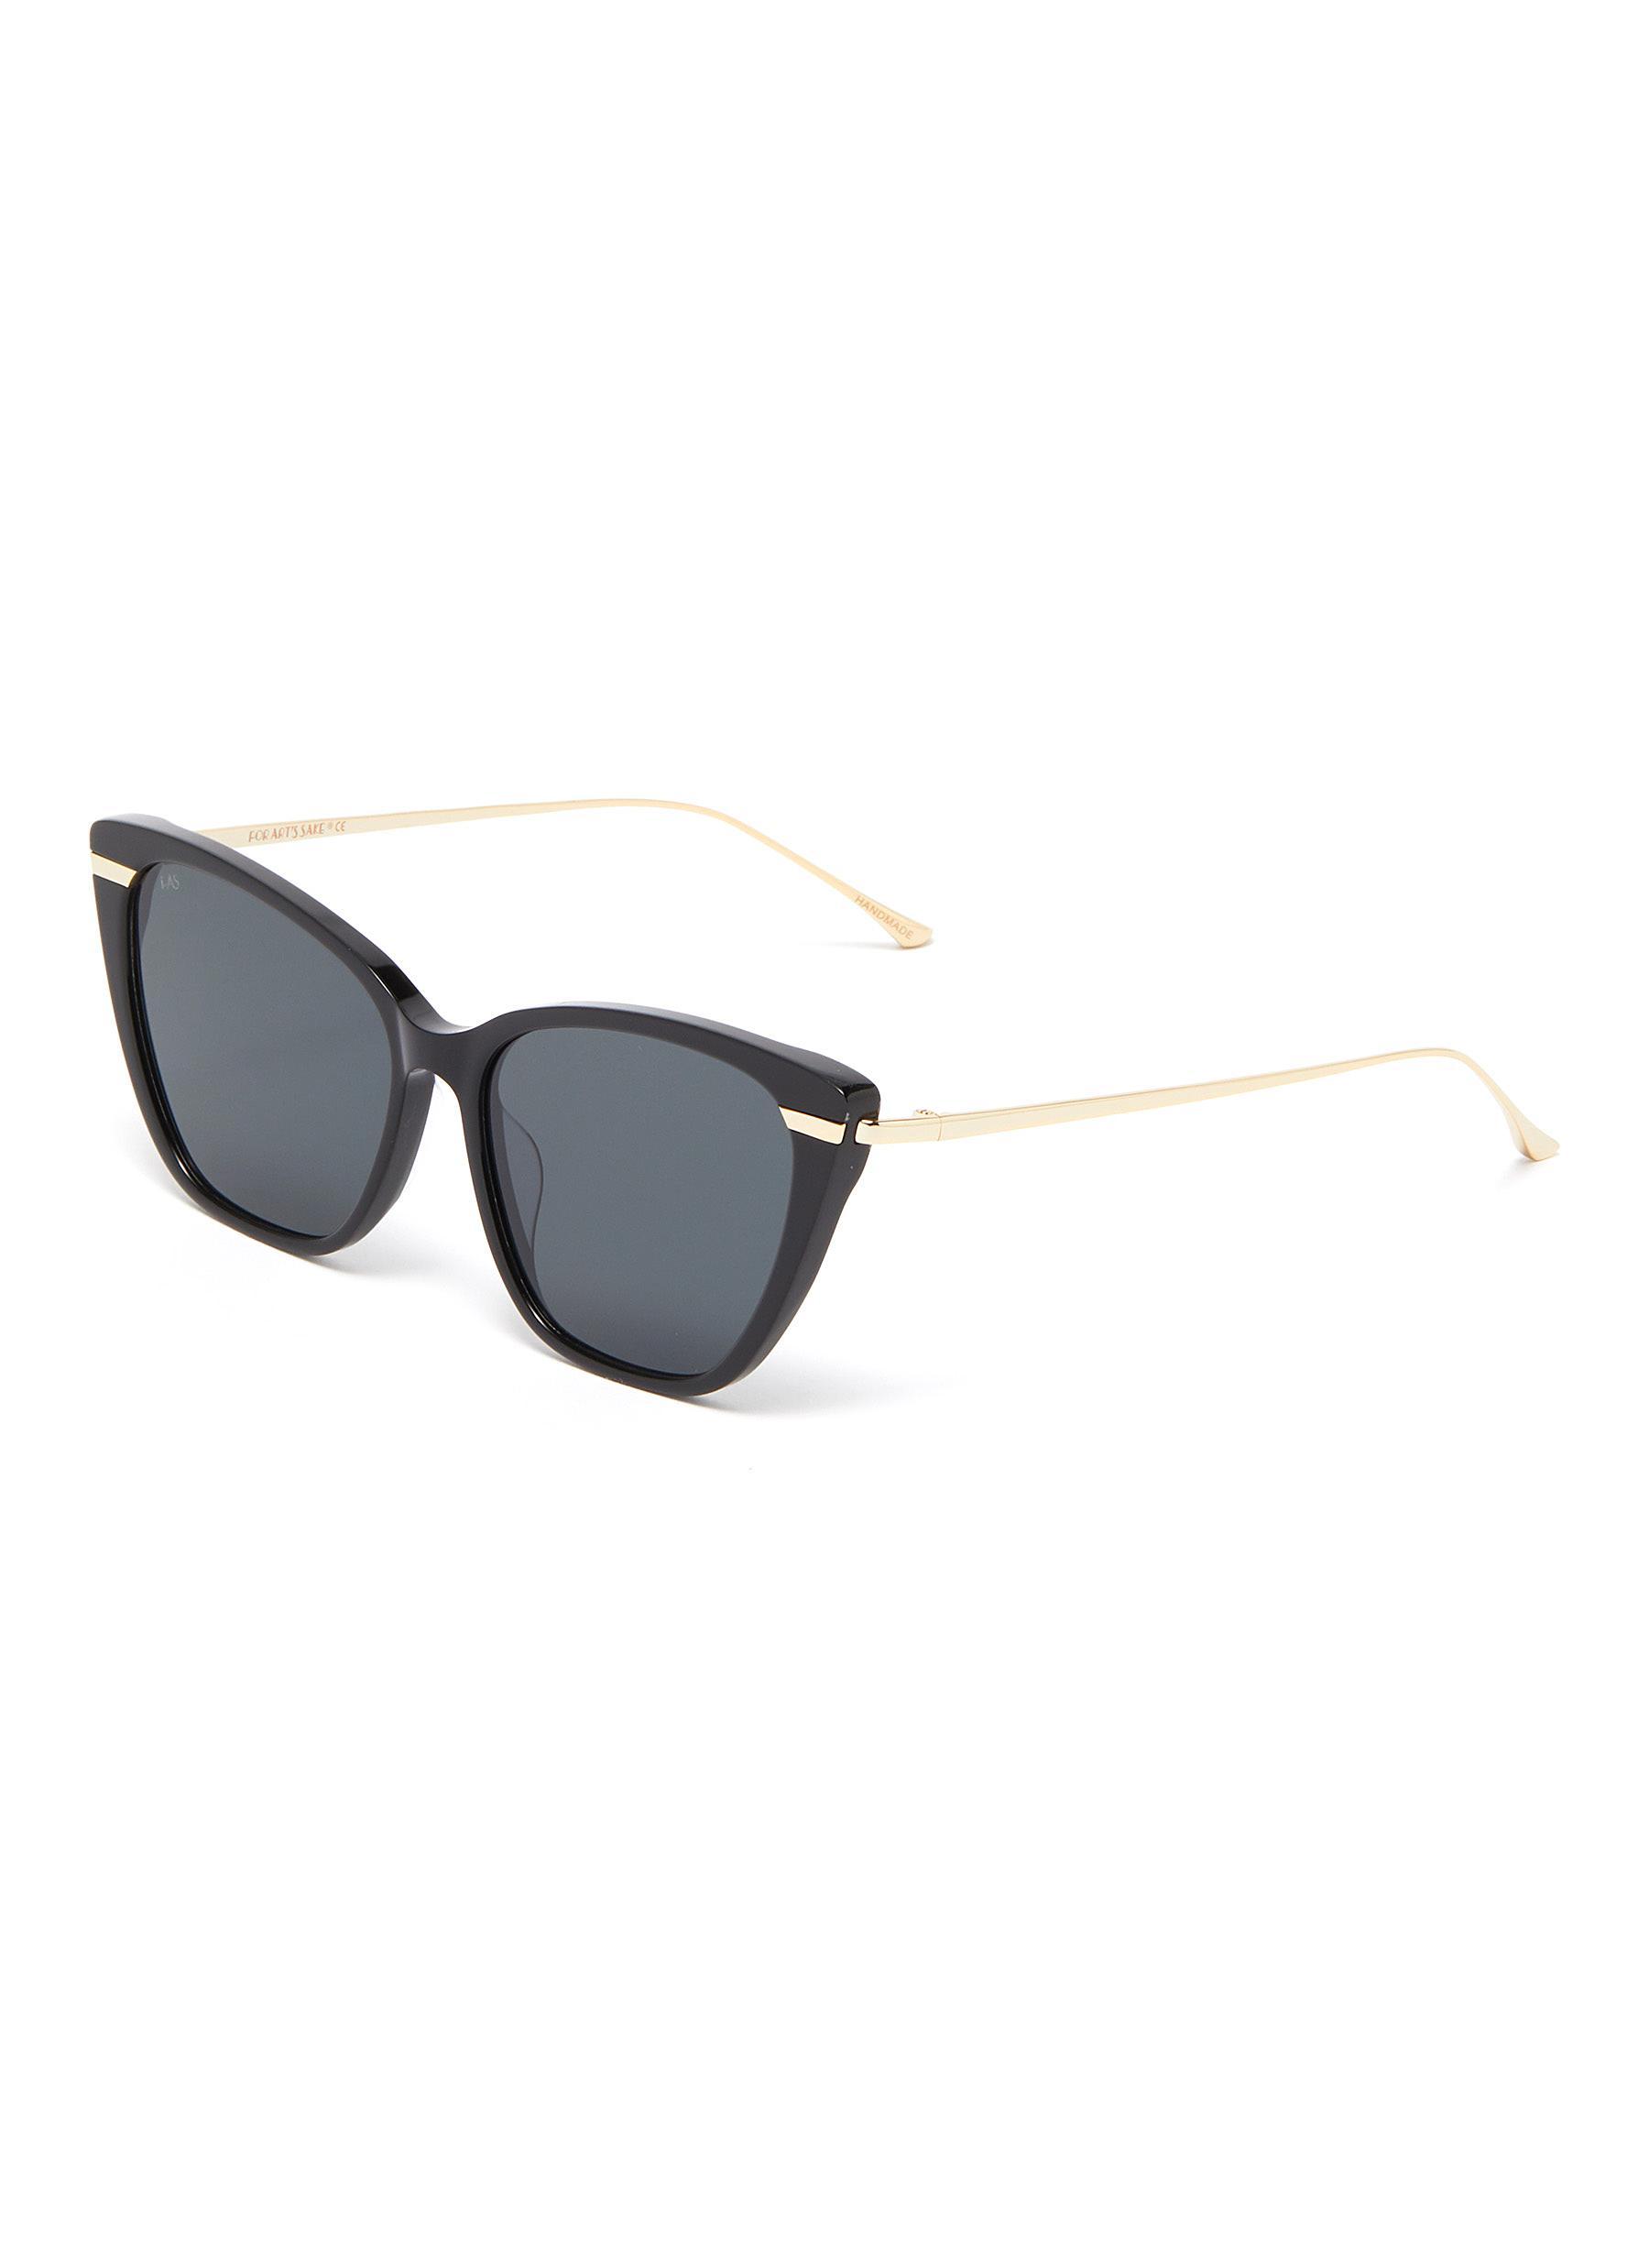 56c10e5524 For Art s Sake.  French Kiss  acetate front metal cat eye sunglasses